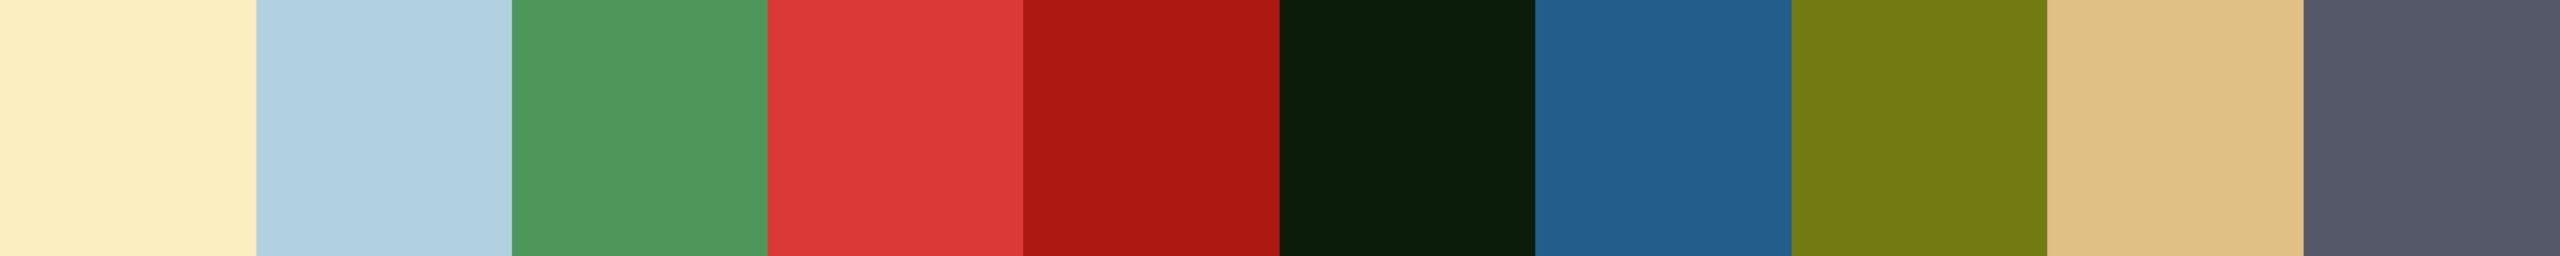 708 Keridinia Color Palette